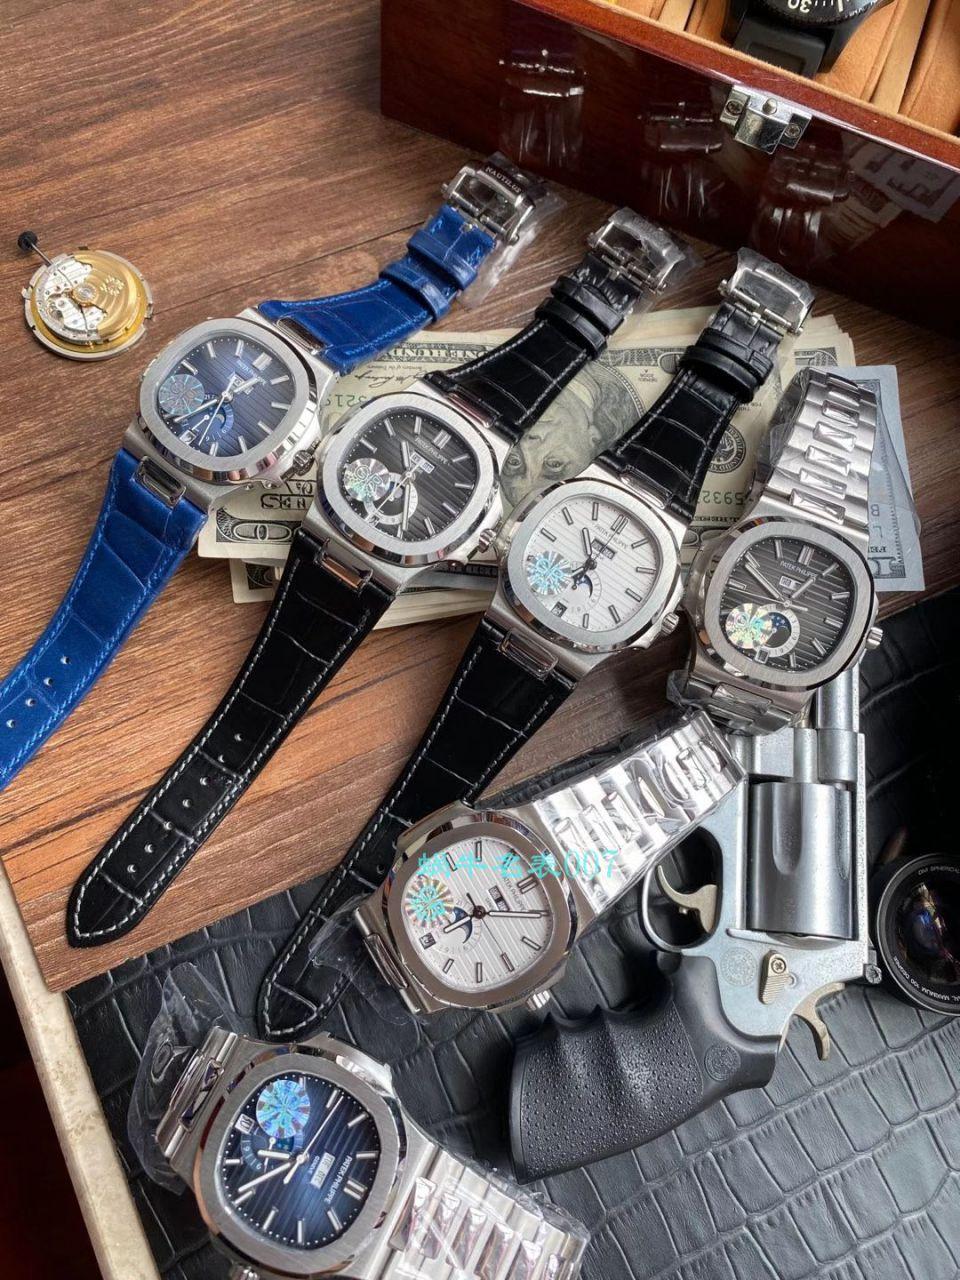 GR厂百达翡丽顶级复刻手表价格最好版本鹦鹉螺V2真月相5726/1A-010皮带款 / BD323